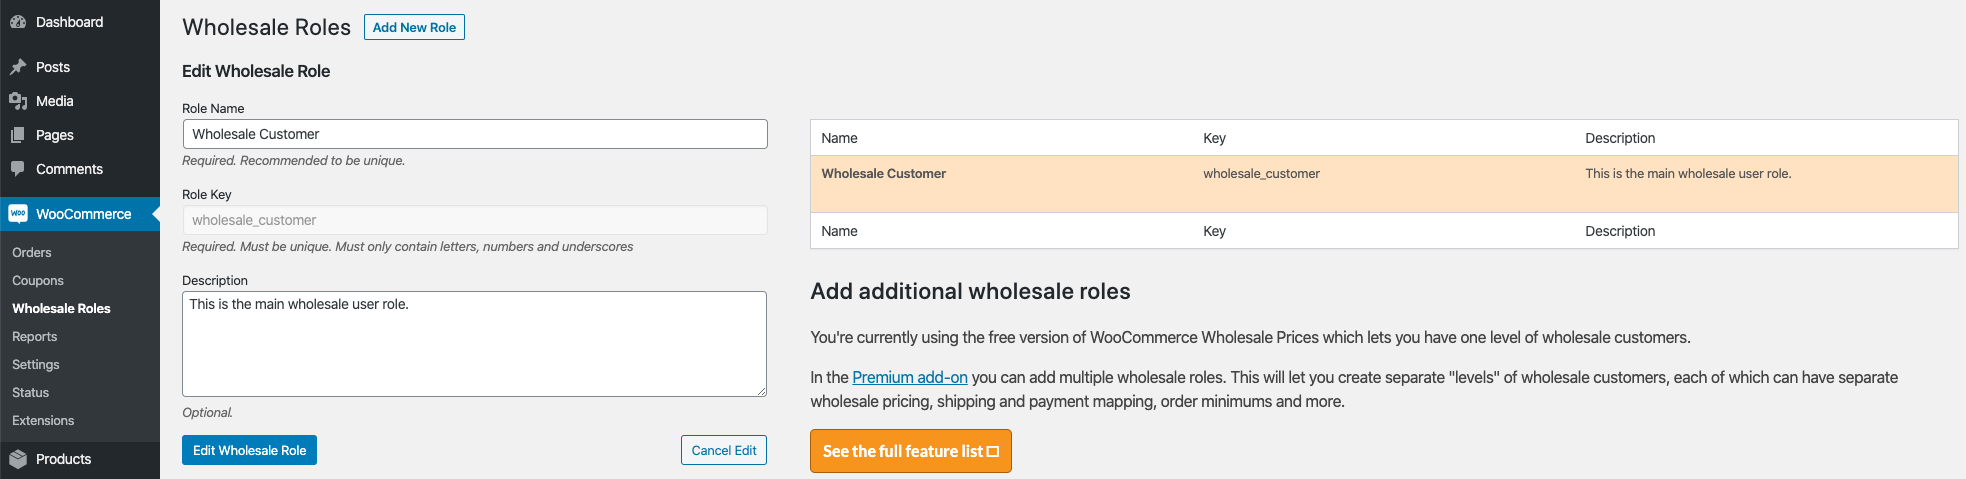 WooCommerce Wholesale Roles Editing